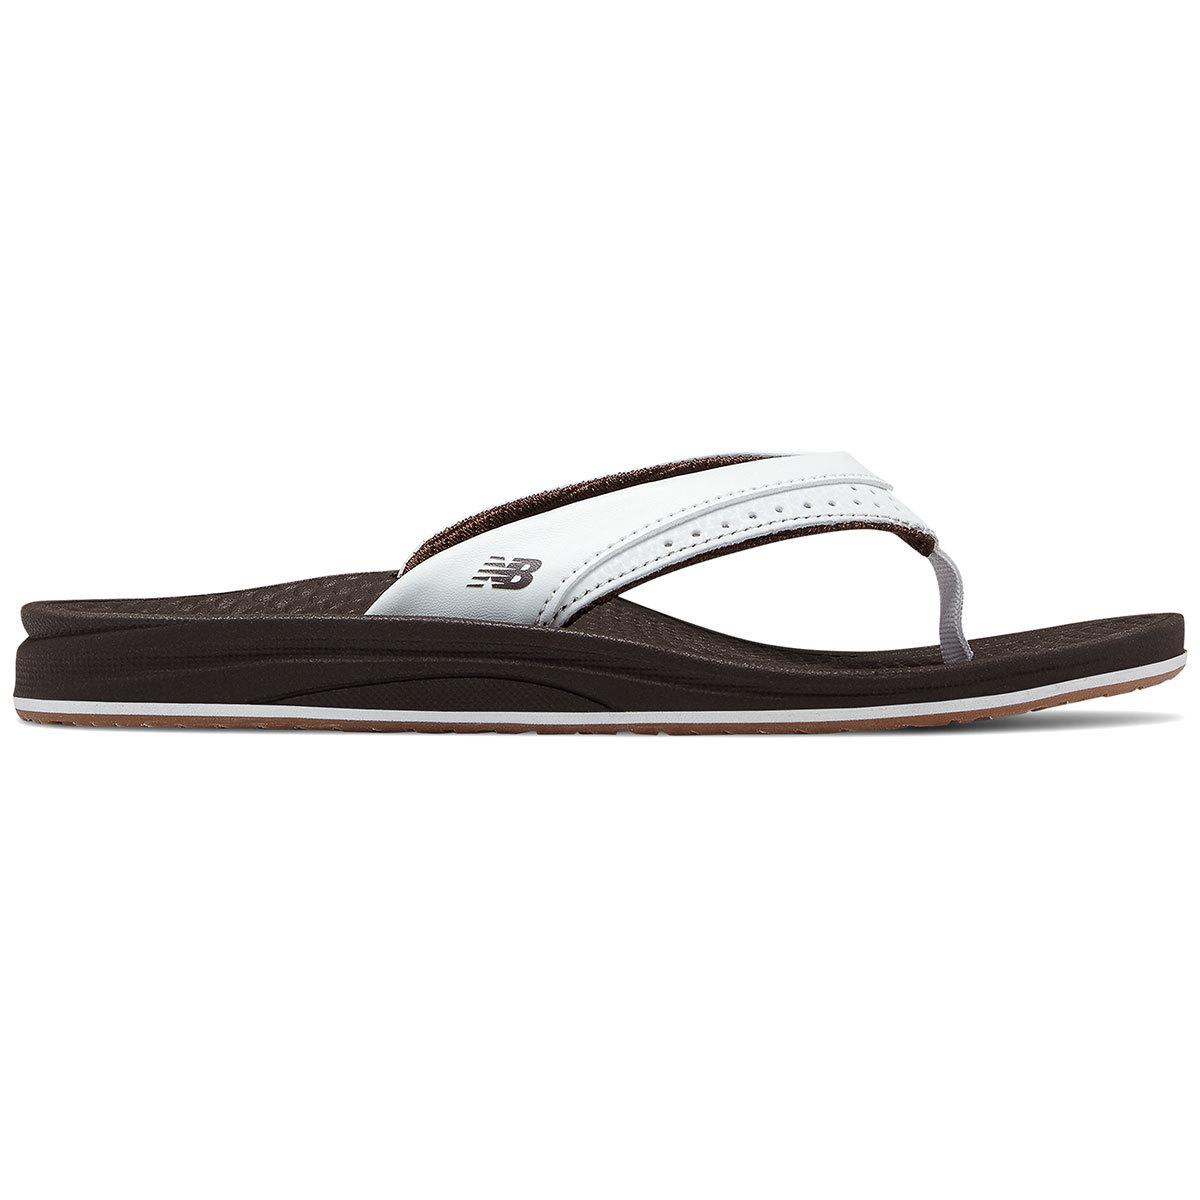 New Balance Women's Renew Thong Sandals - Brown, 9